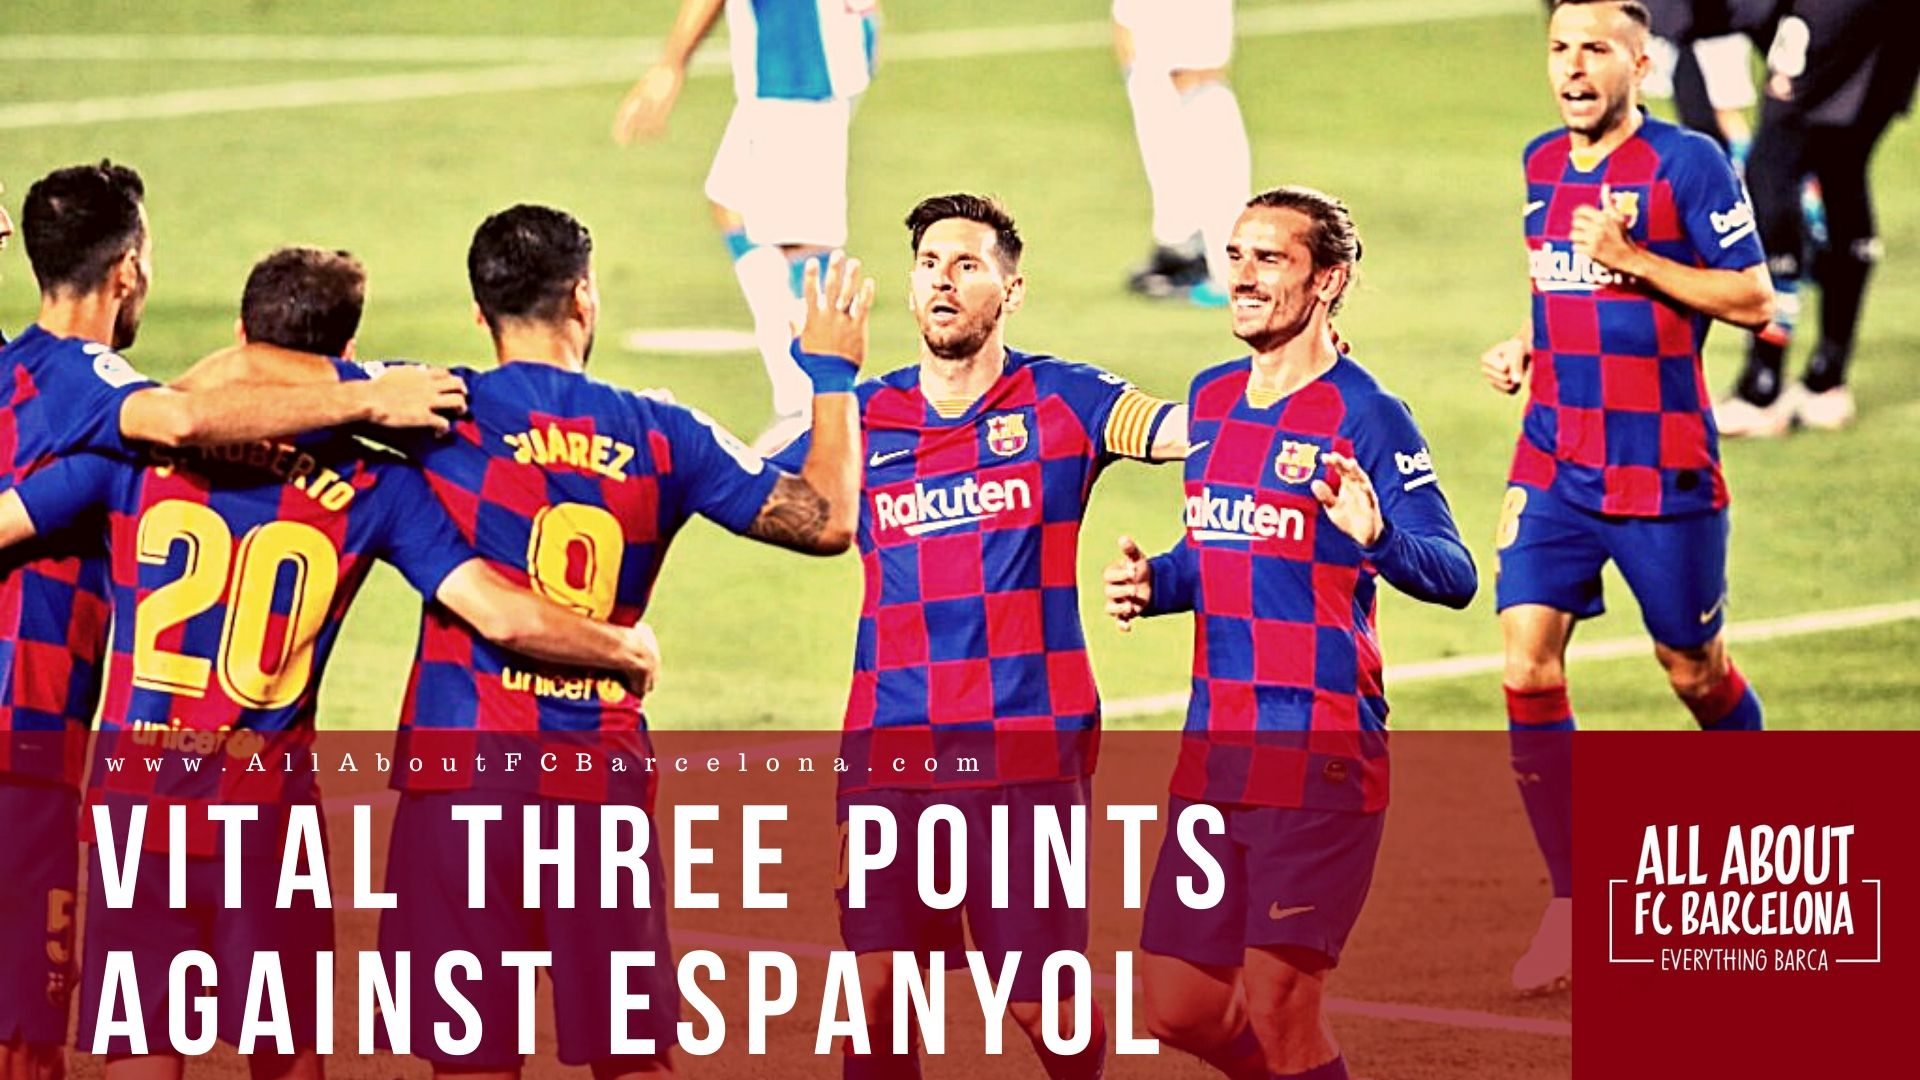 Barcelona Players Celebrating victory over Espanyol